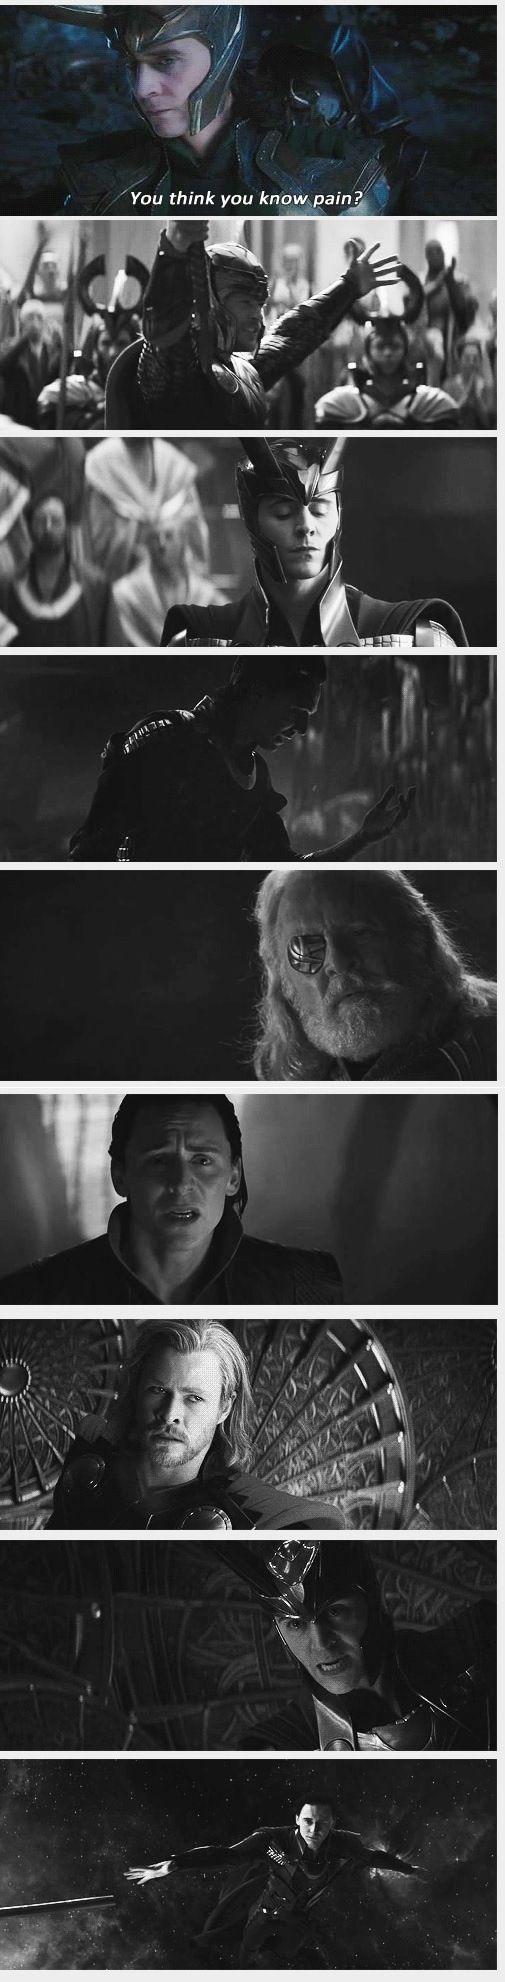 Loki - Tom Hiddleston This made me feel so sad....Poor Loki!!!:(